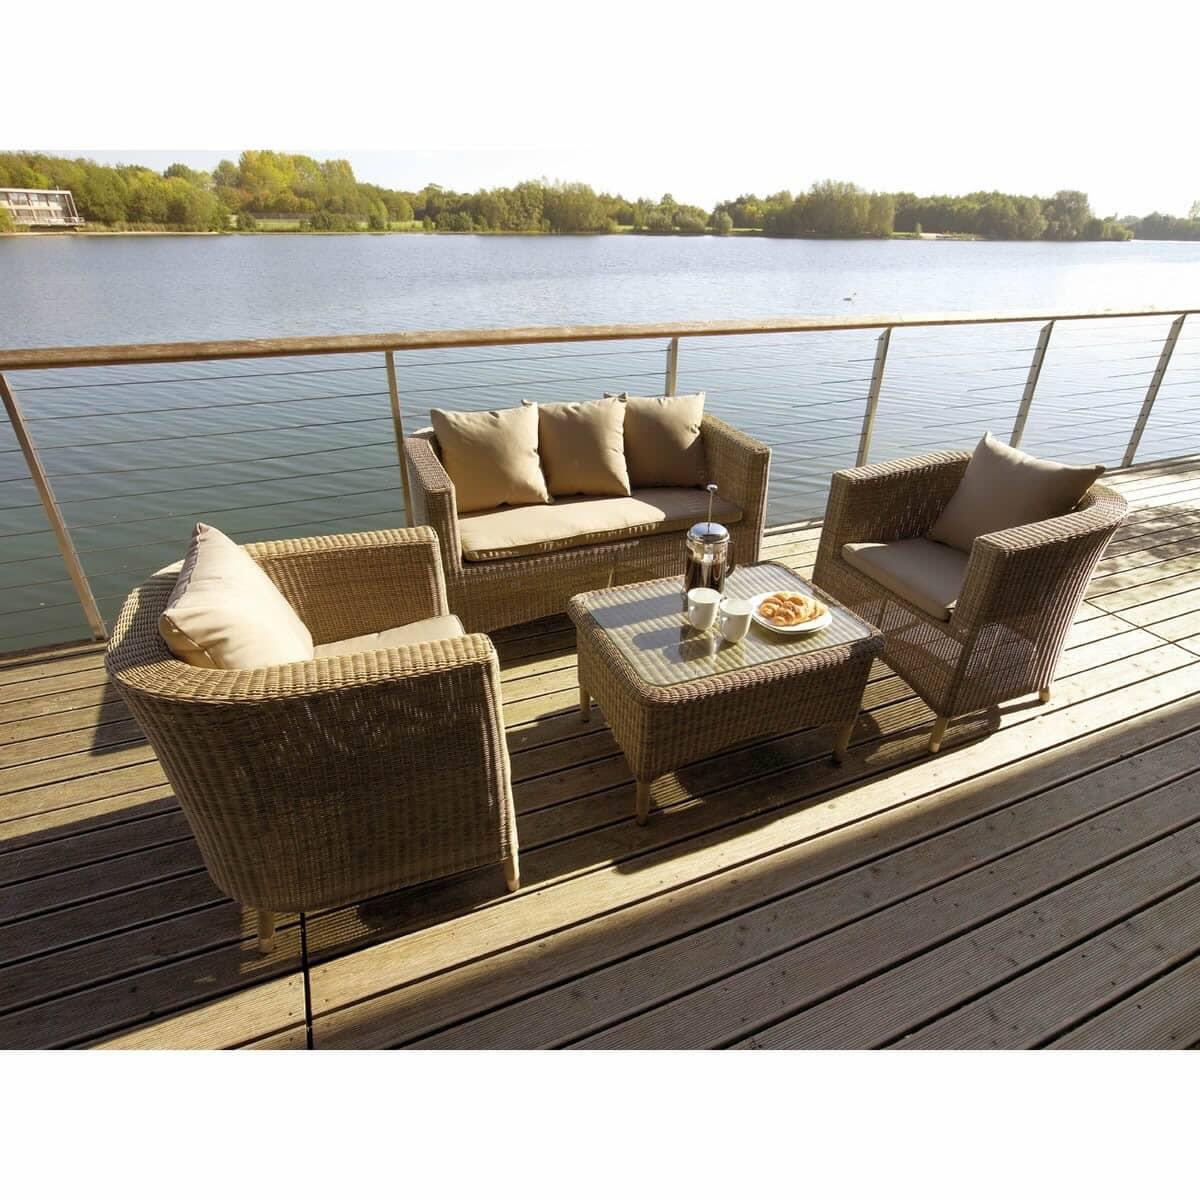 bramblecrest sahara classic sofa set sahset01 garden. Black Bedroom Furniture Sets. Home Design Ideas